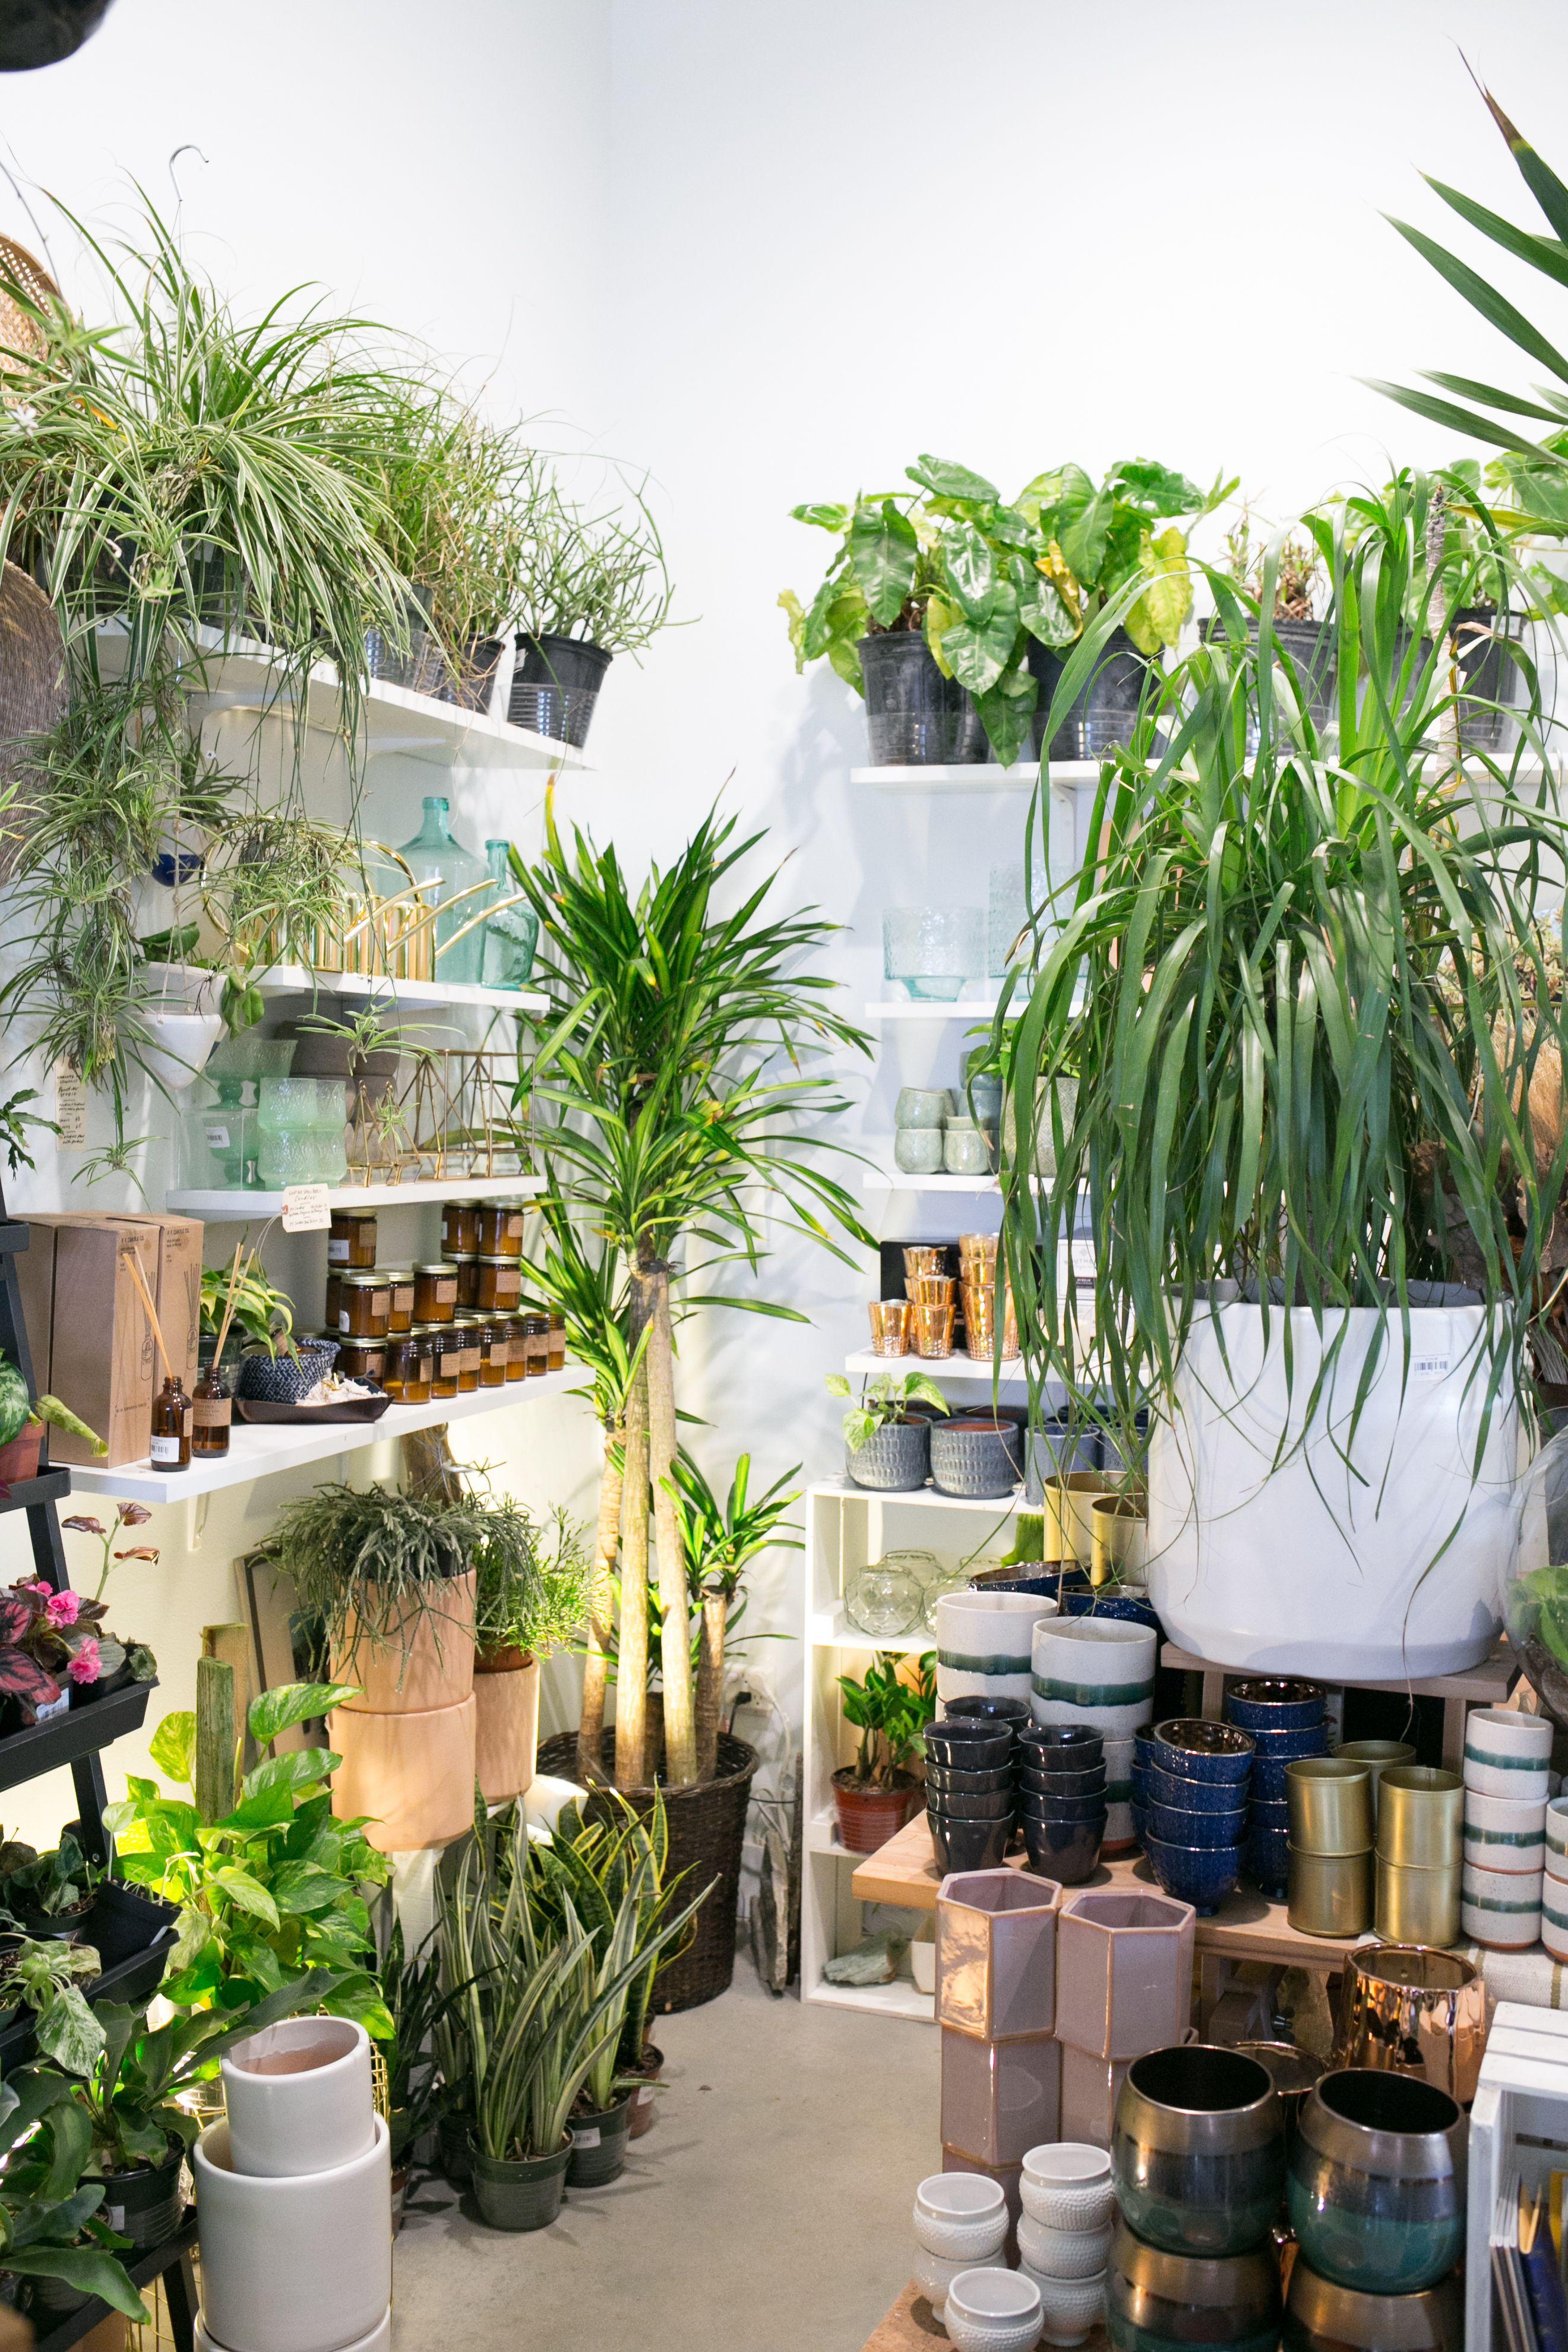 Great New Mid Mod Shop Tillandsia Display Garden Center